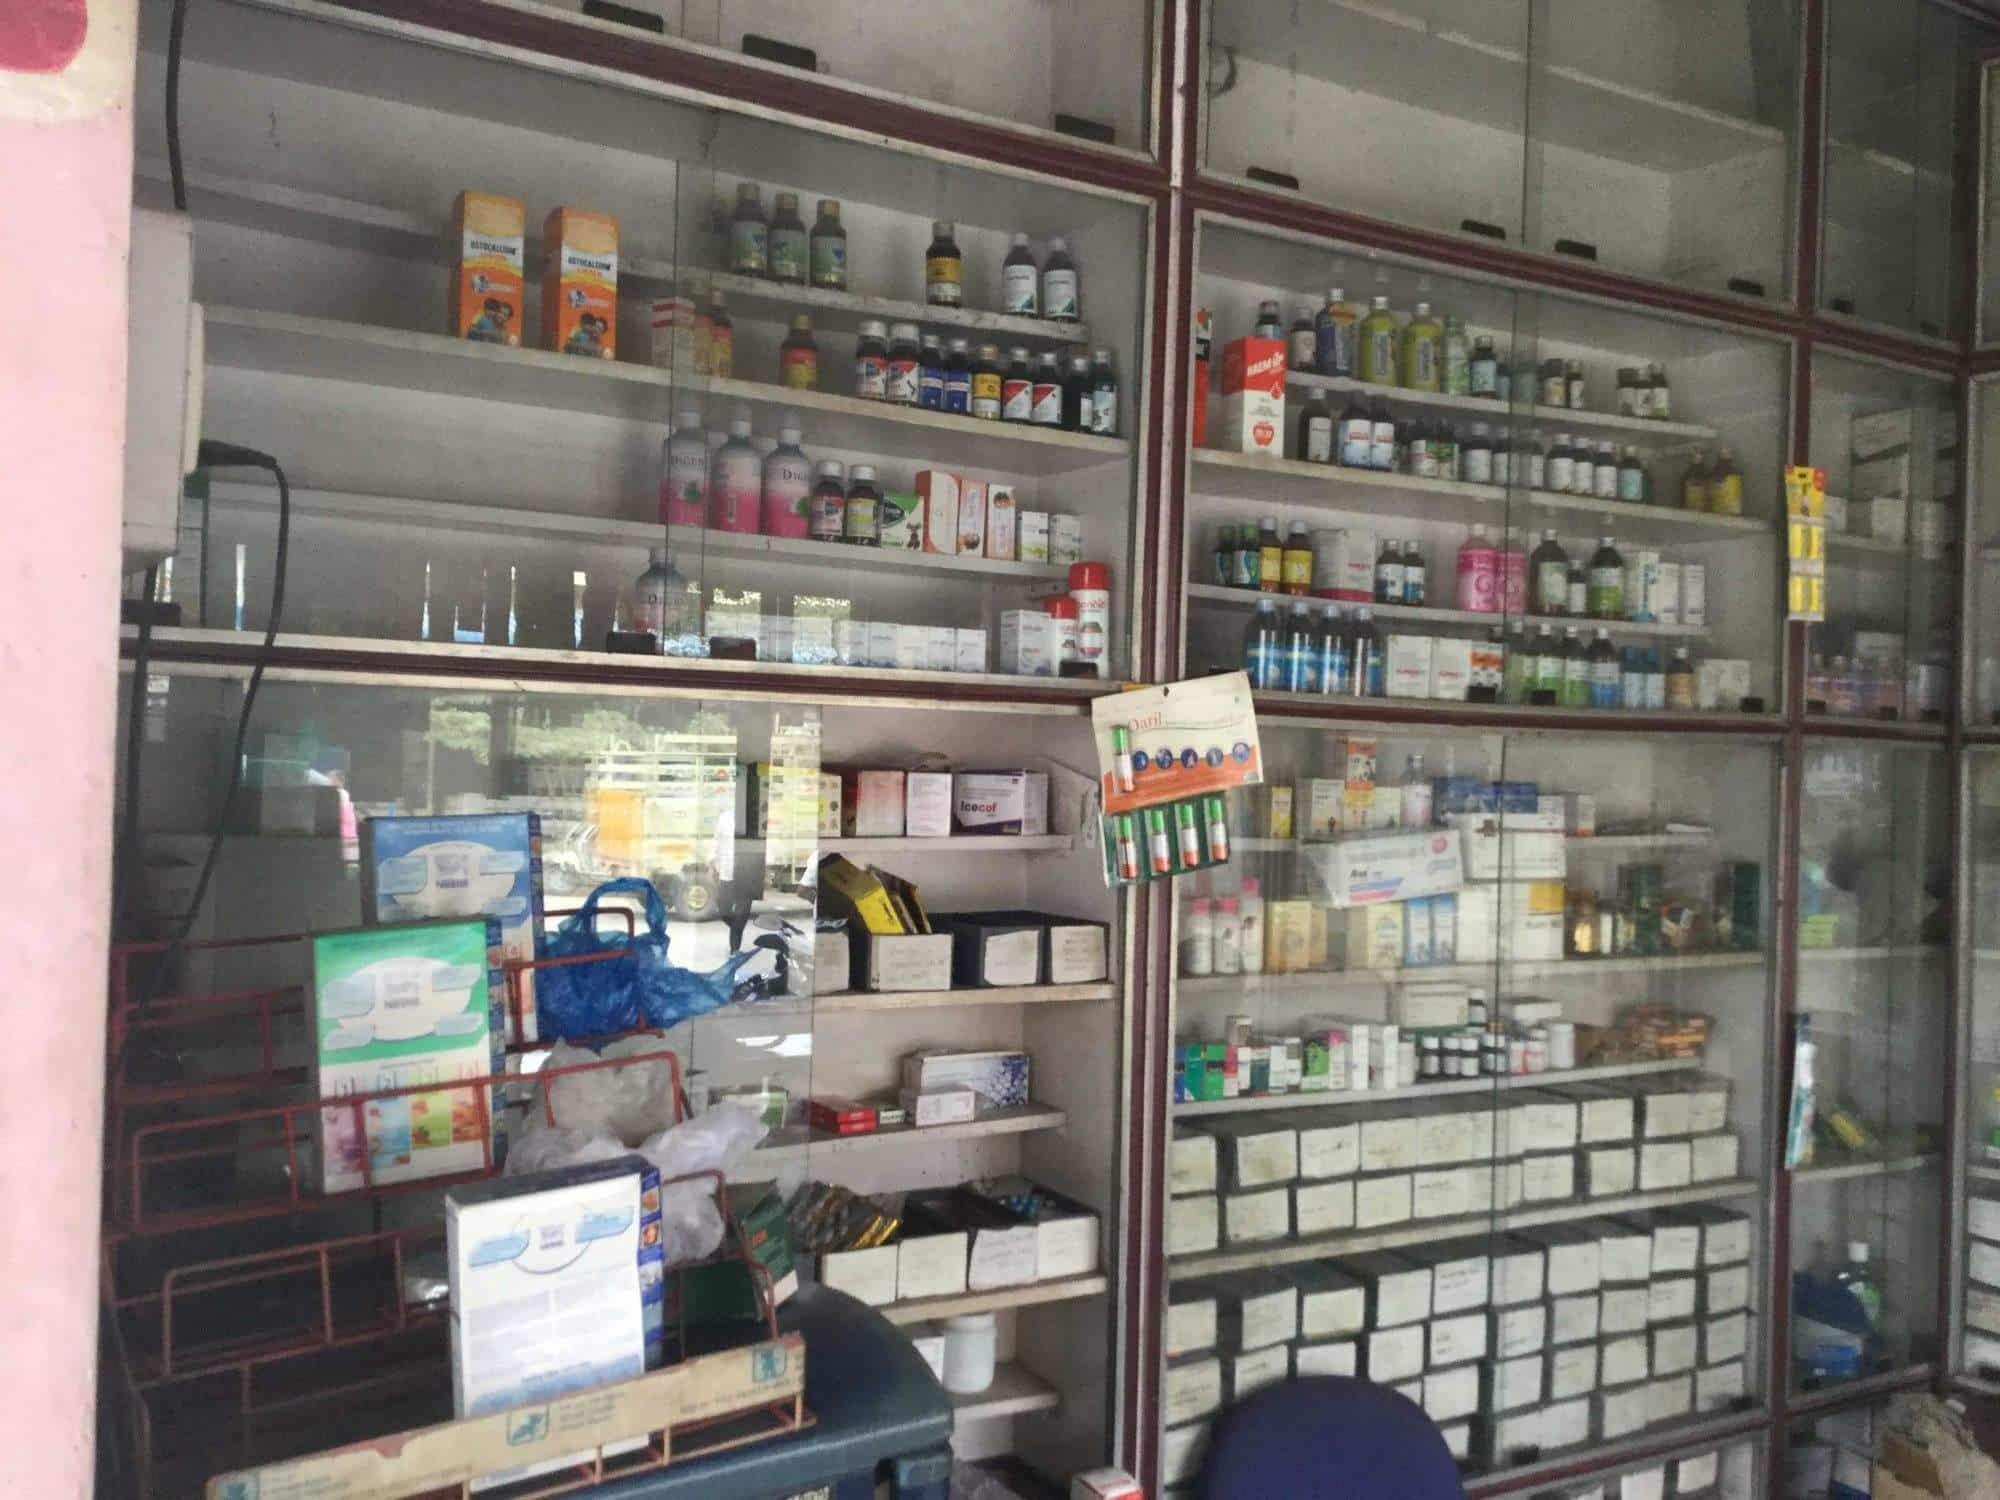 Tamilnadu pharmacy kitchipalayam chemists in salem justdial solutioingenieria Image collections